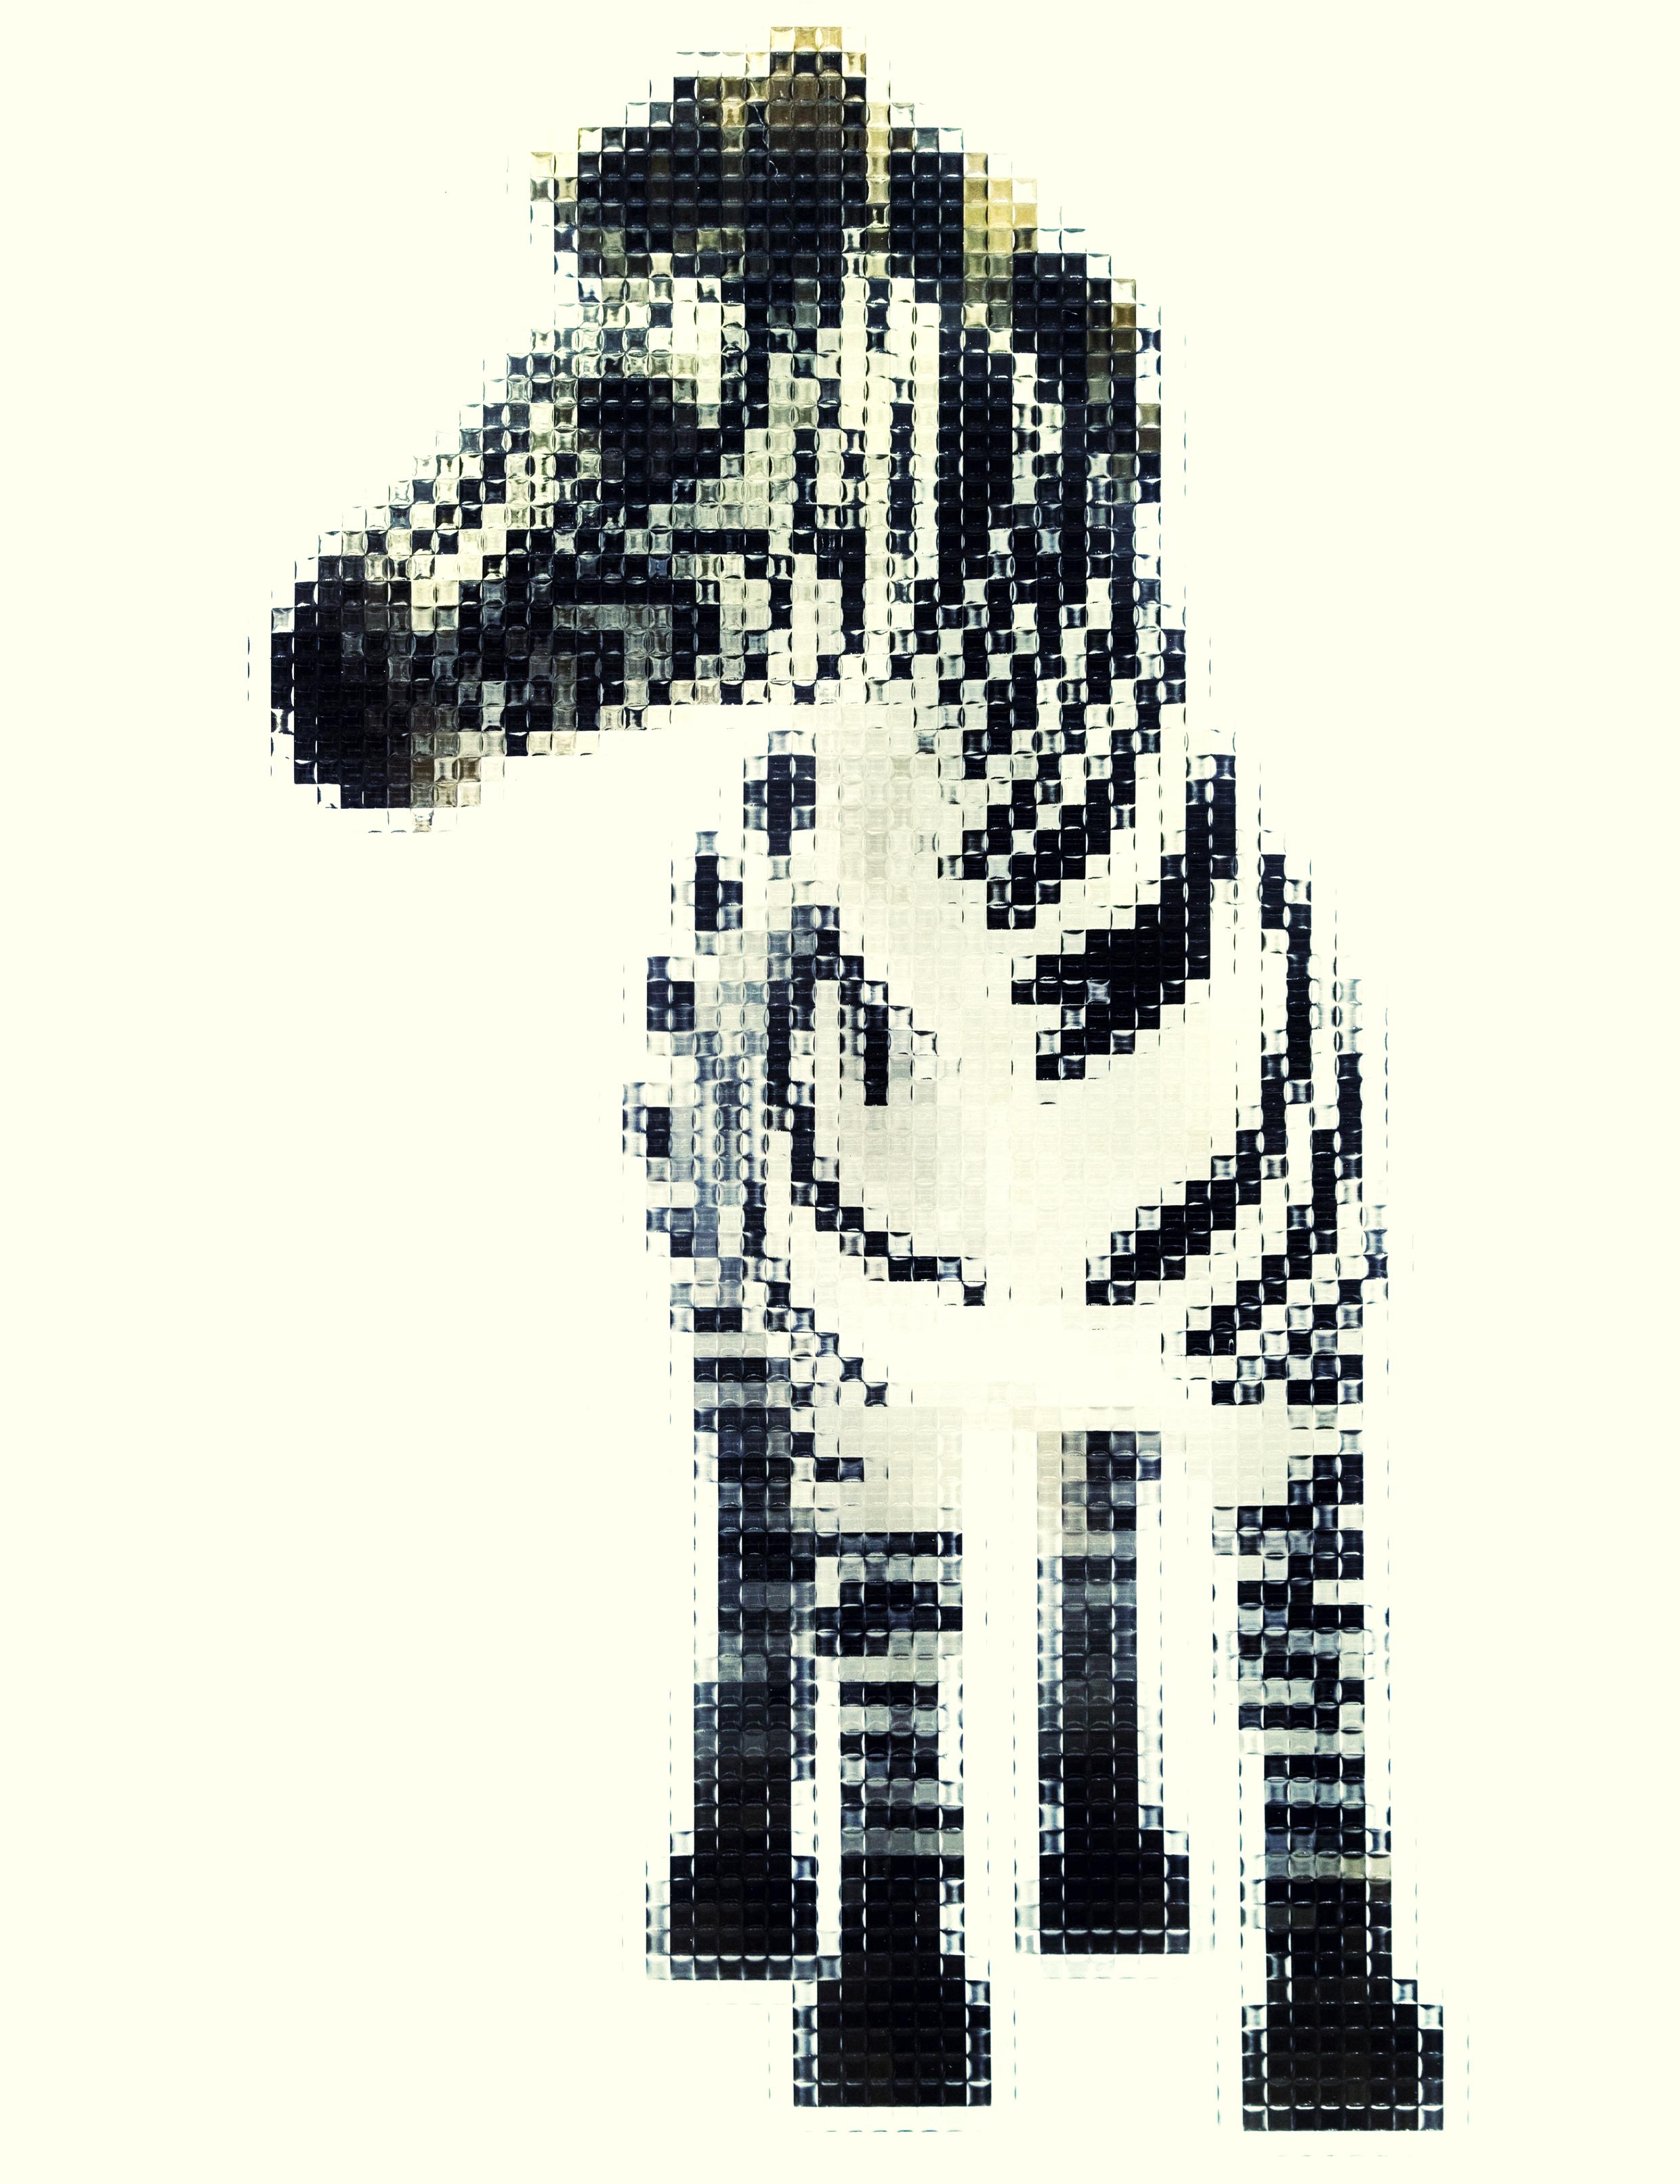 light sense #6 100 cm x 130 cm 2010 Pigment print on fineart paper